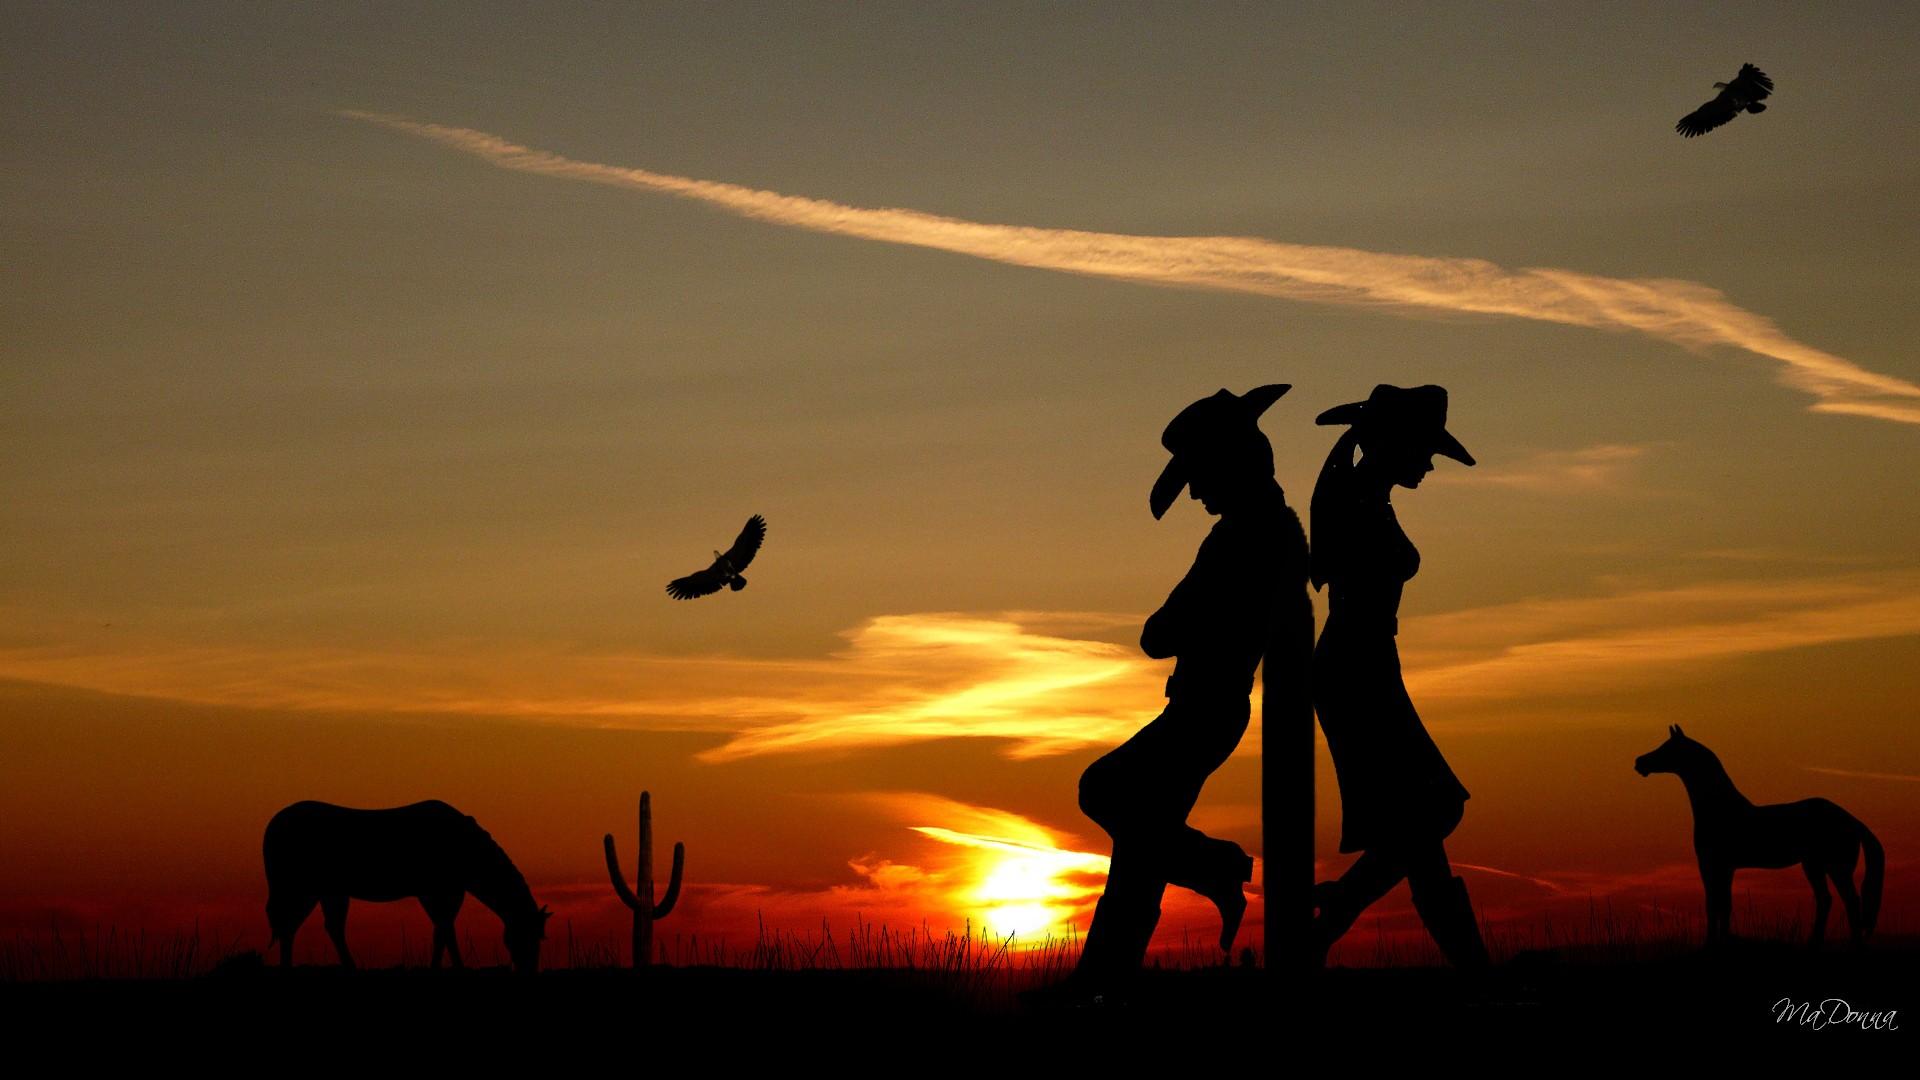 cactus cowboy Western Romance wallpaper 1920x1080